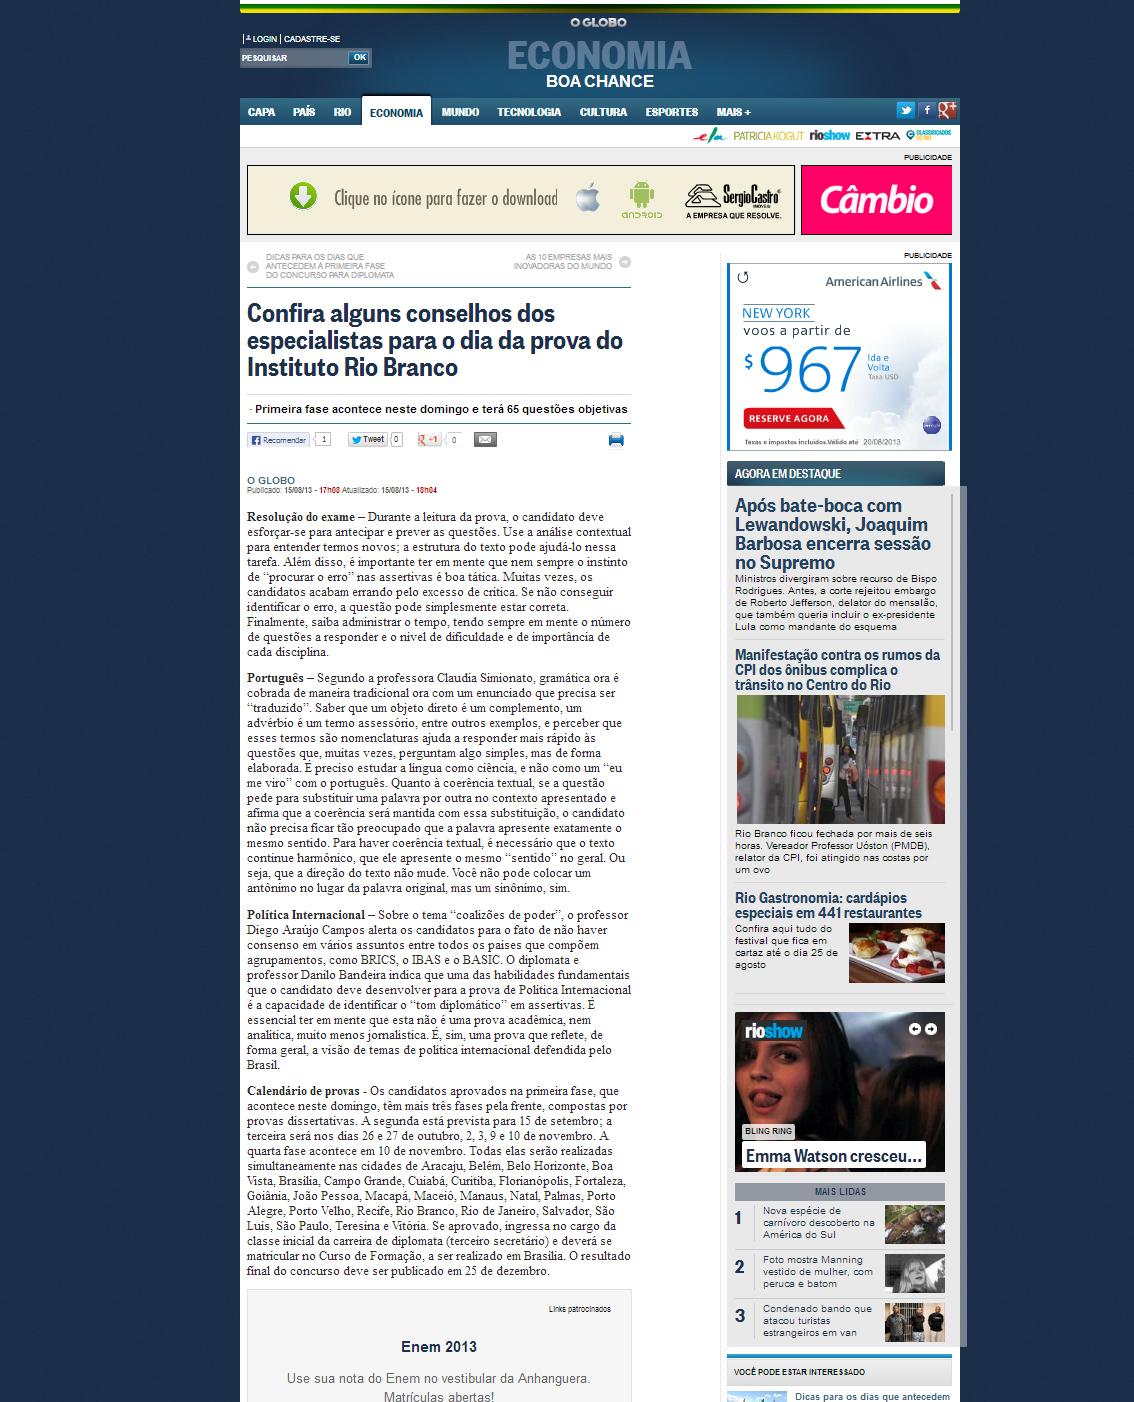 O Globo online materia coordenada 15 agosto 2013